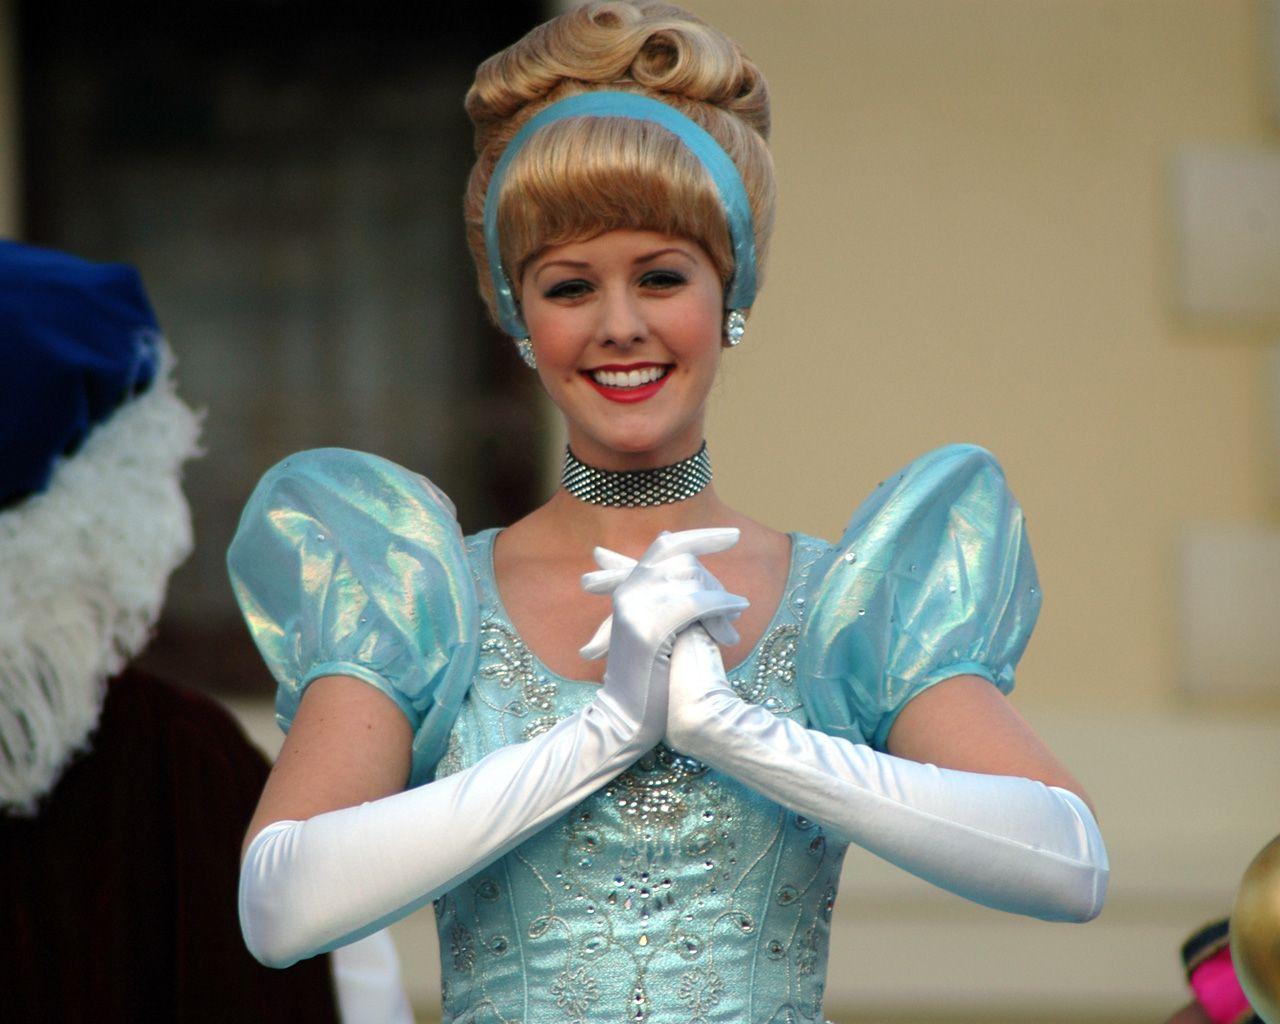 Forced to wear dresses at disneyland stories - Cinderella Parade Of Dreams Disneyland Anaheim Ca